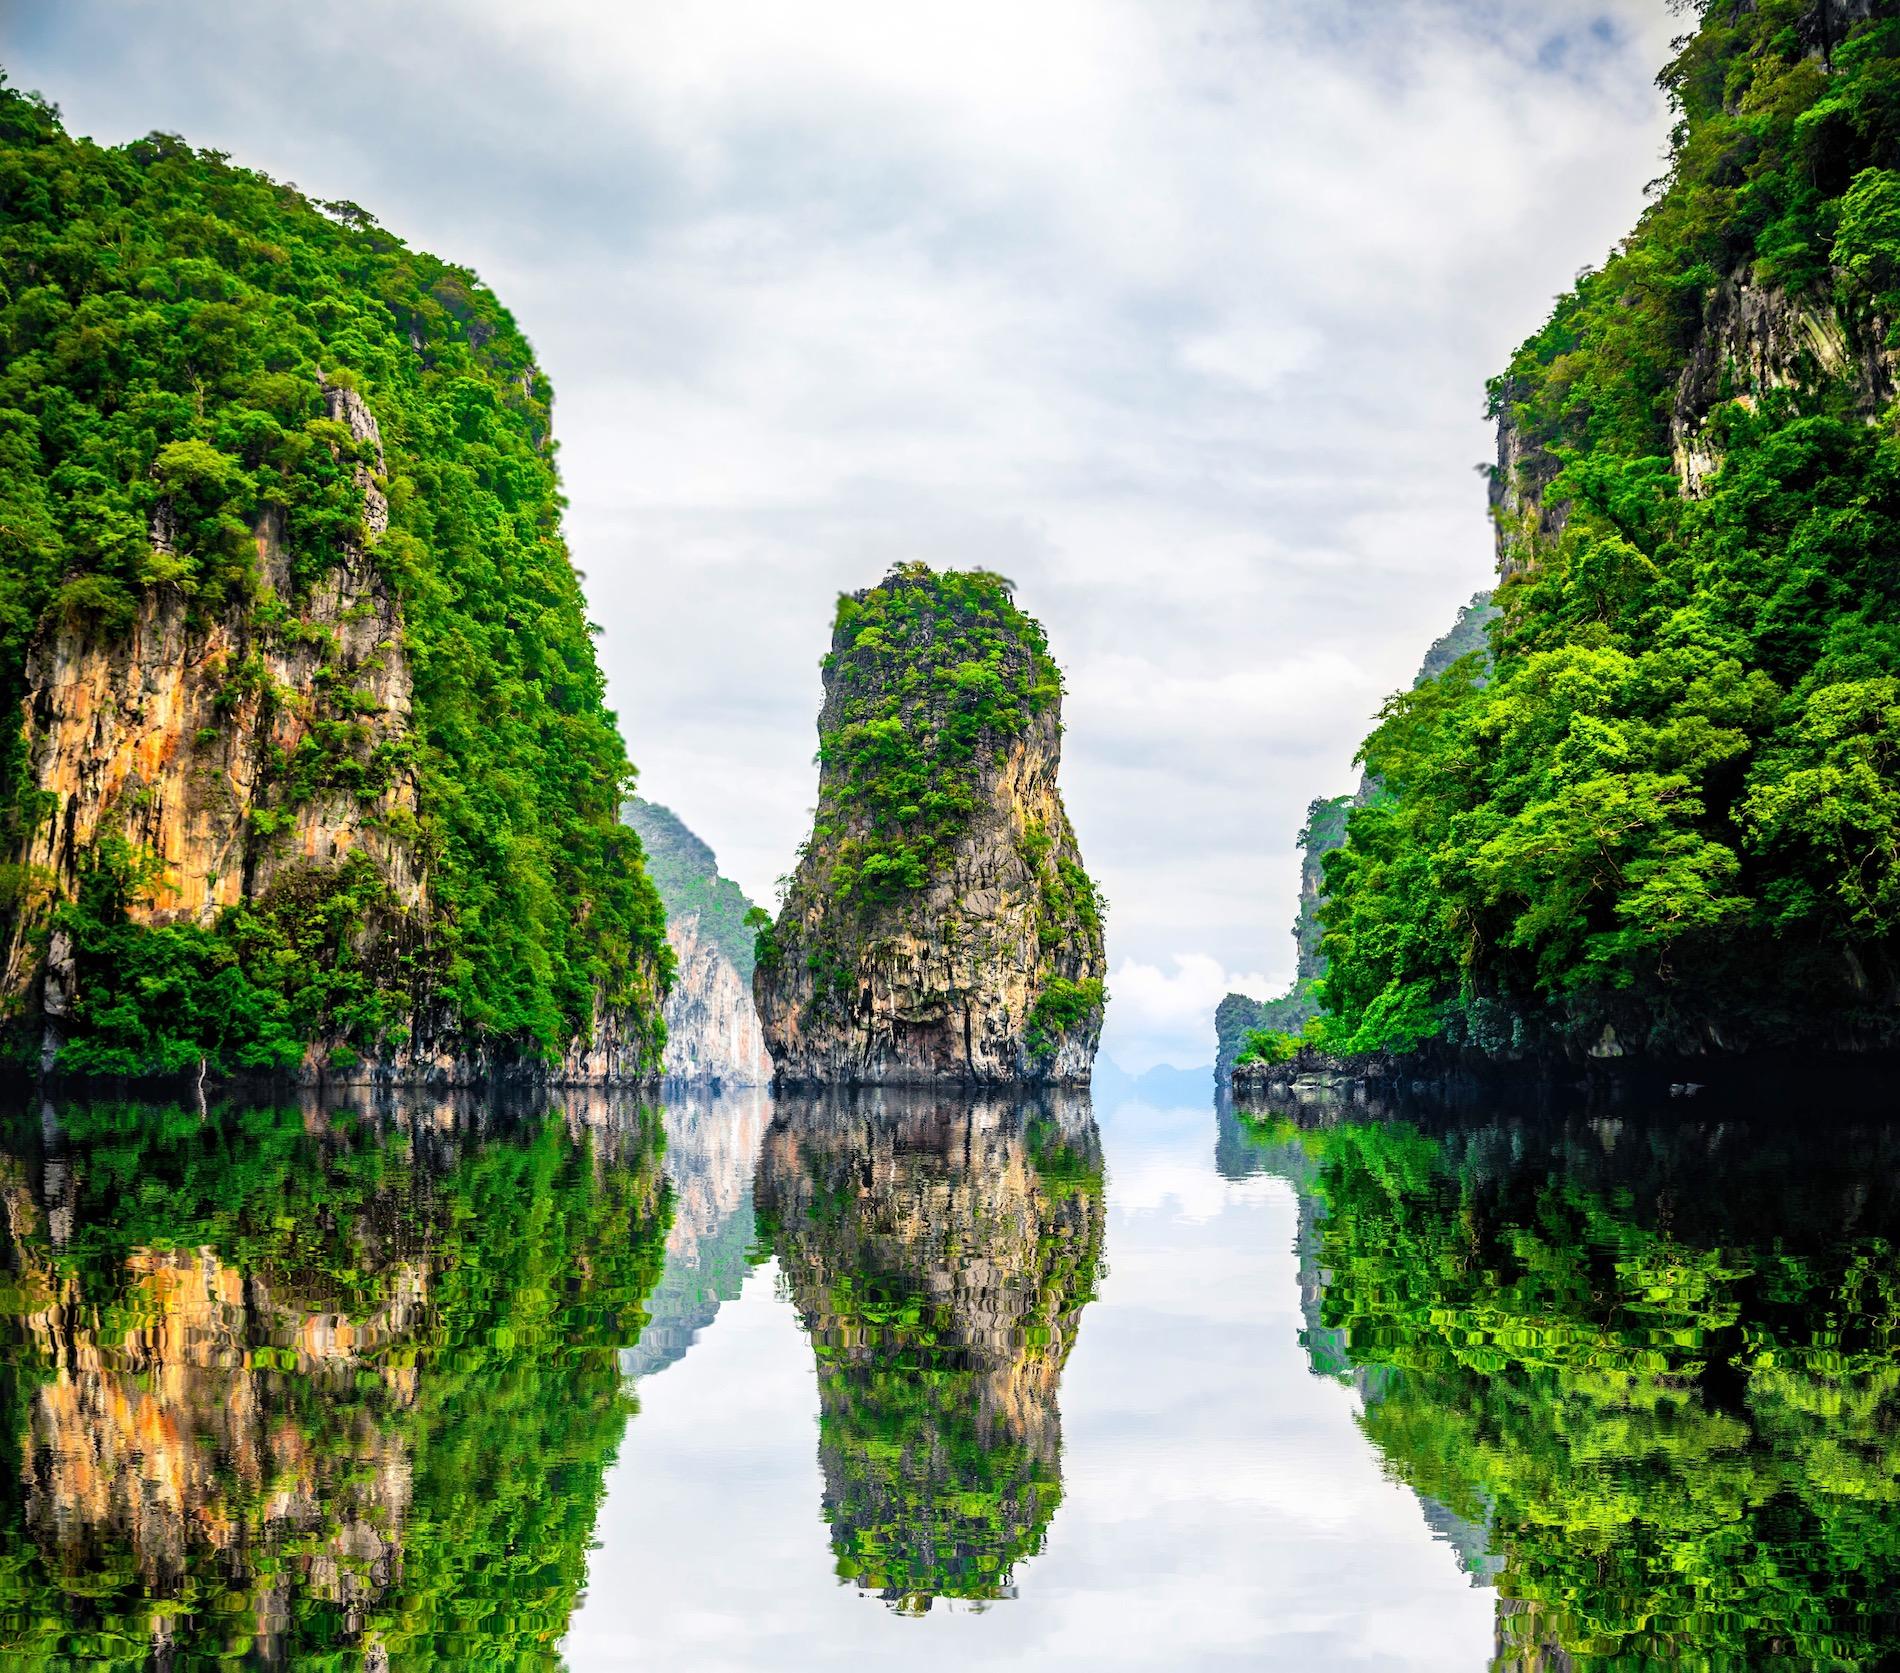 Emirates recommences flights to Phuket from 2 July